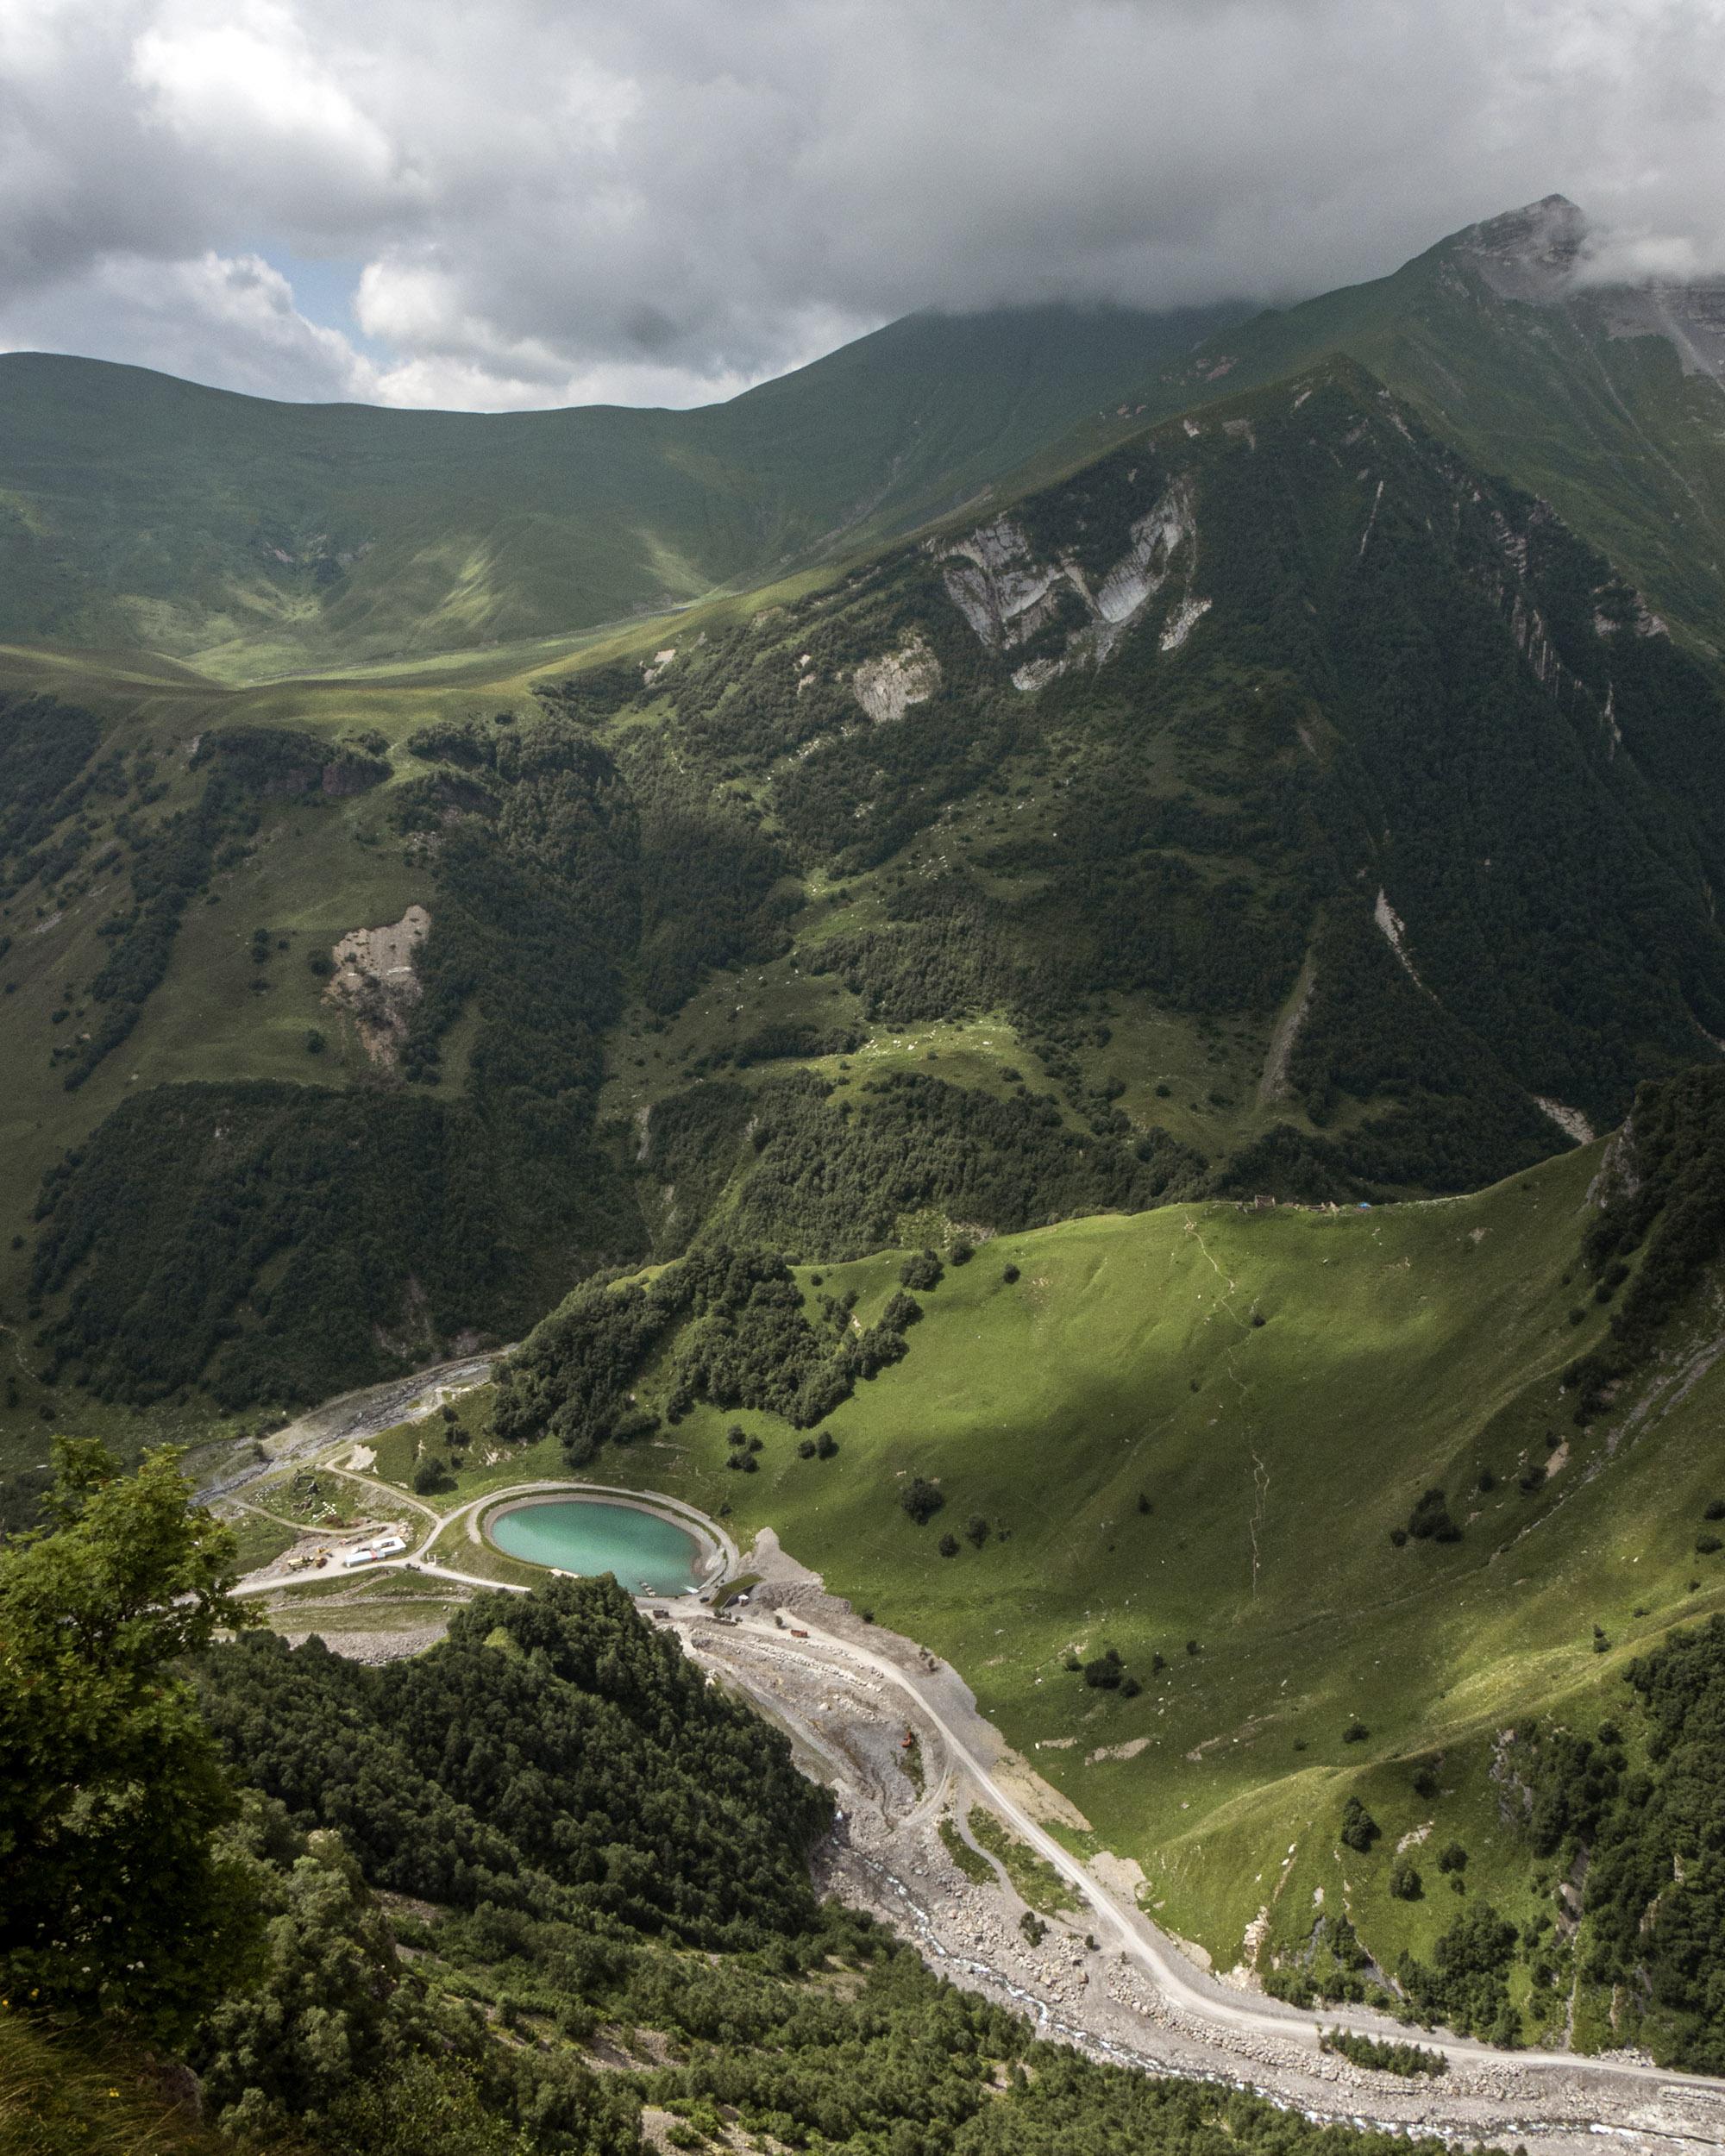 Caucasus Mountain Views in Kazbegi, Georgia